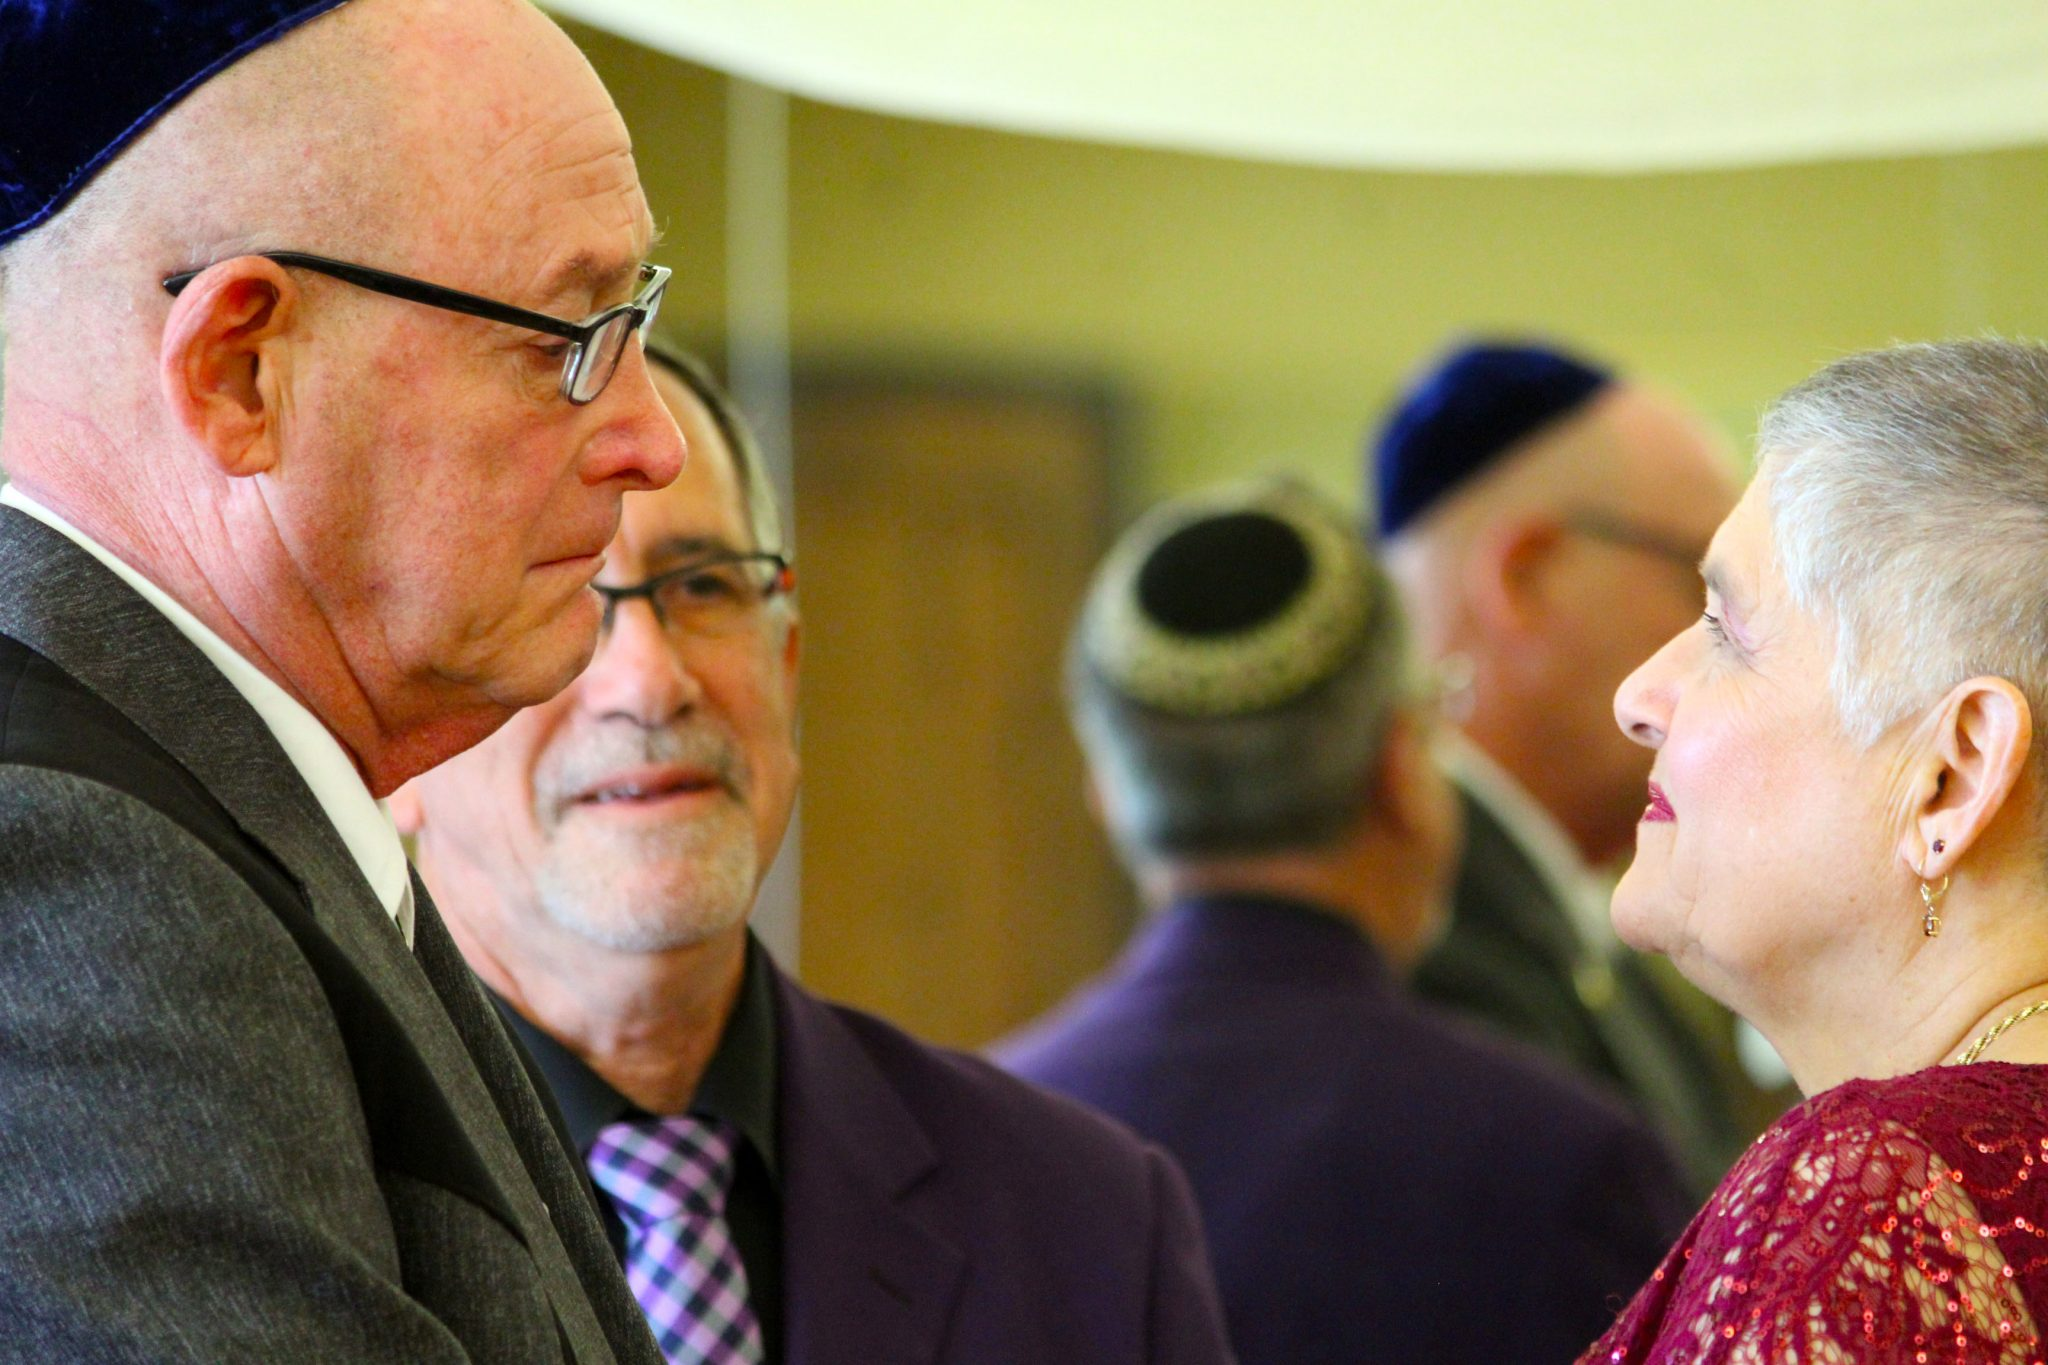 A Jewish Wedding on Friday the Thirteenth